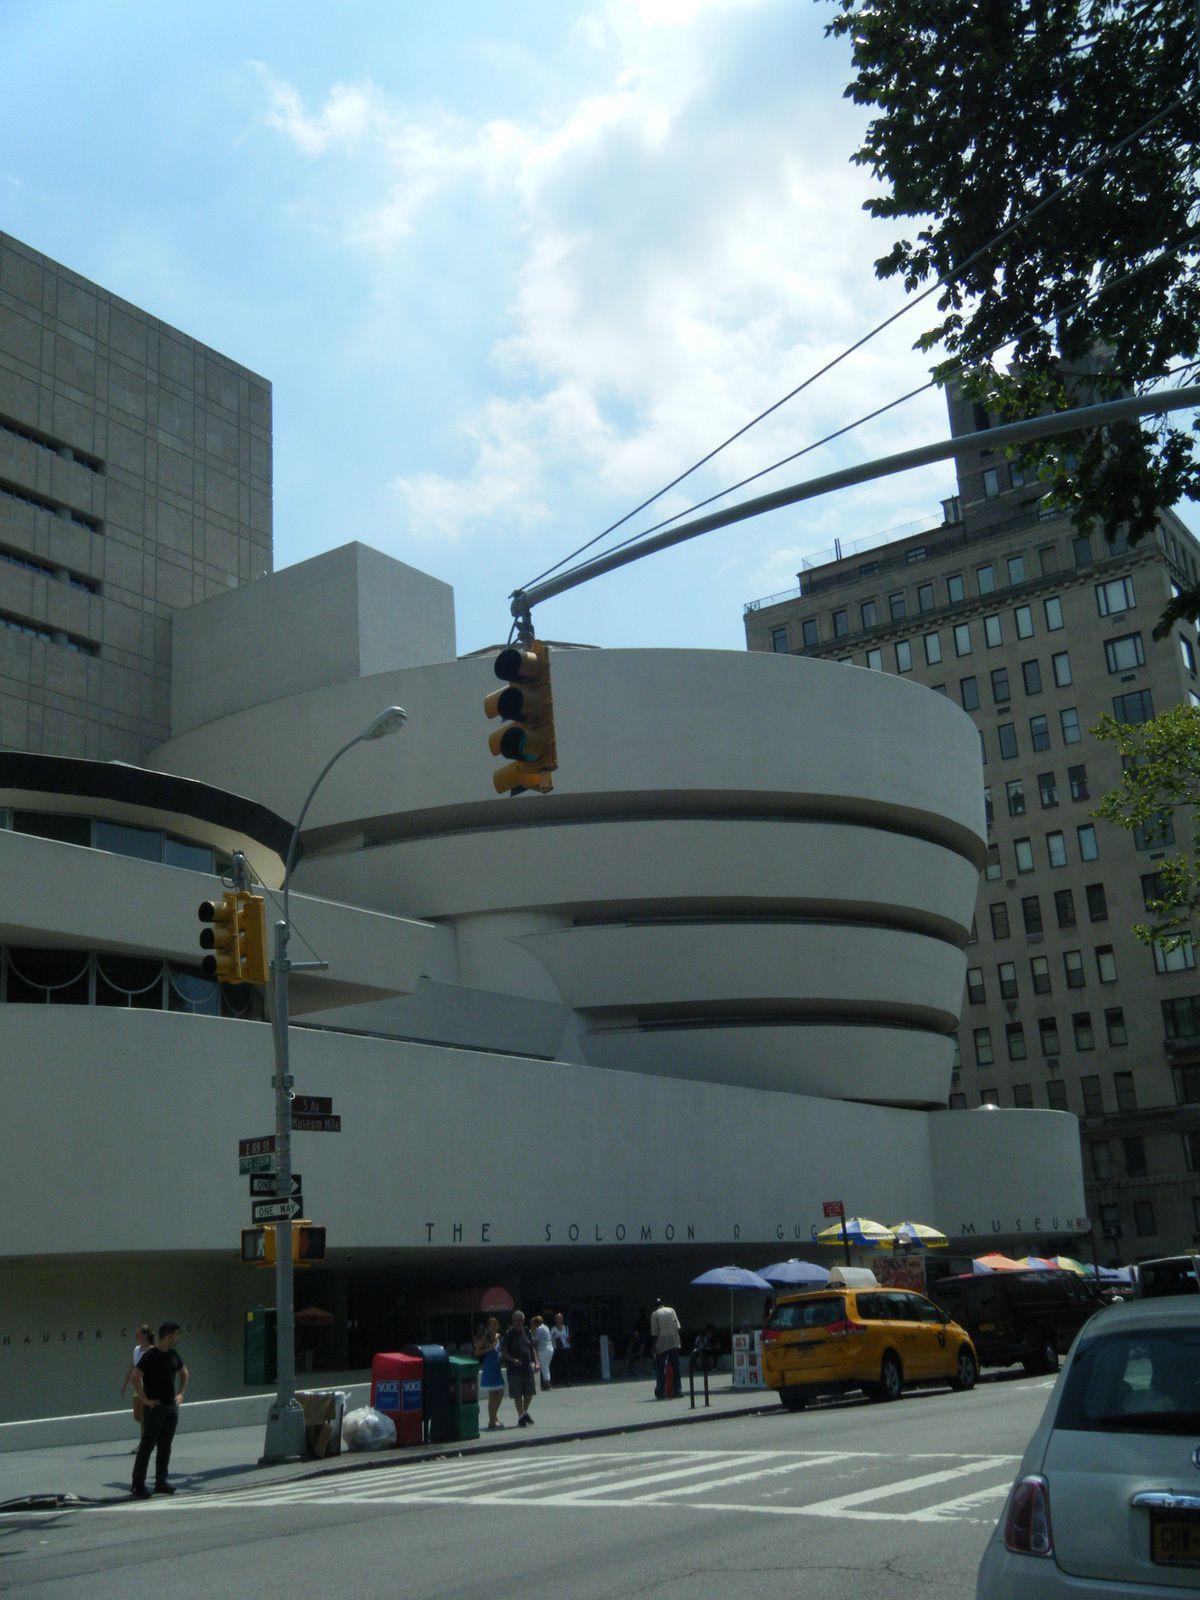 Musée Guggenheim, One World, Coney Island, High Line, Brooklyn